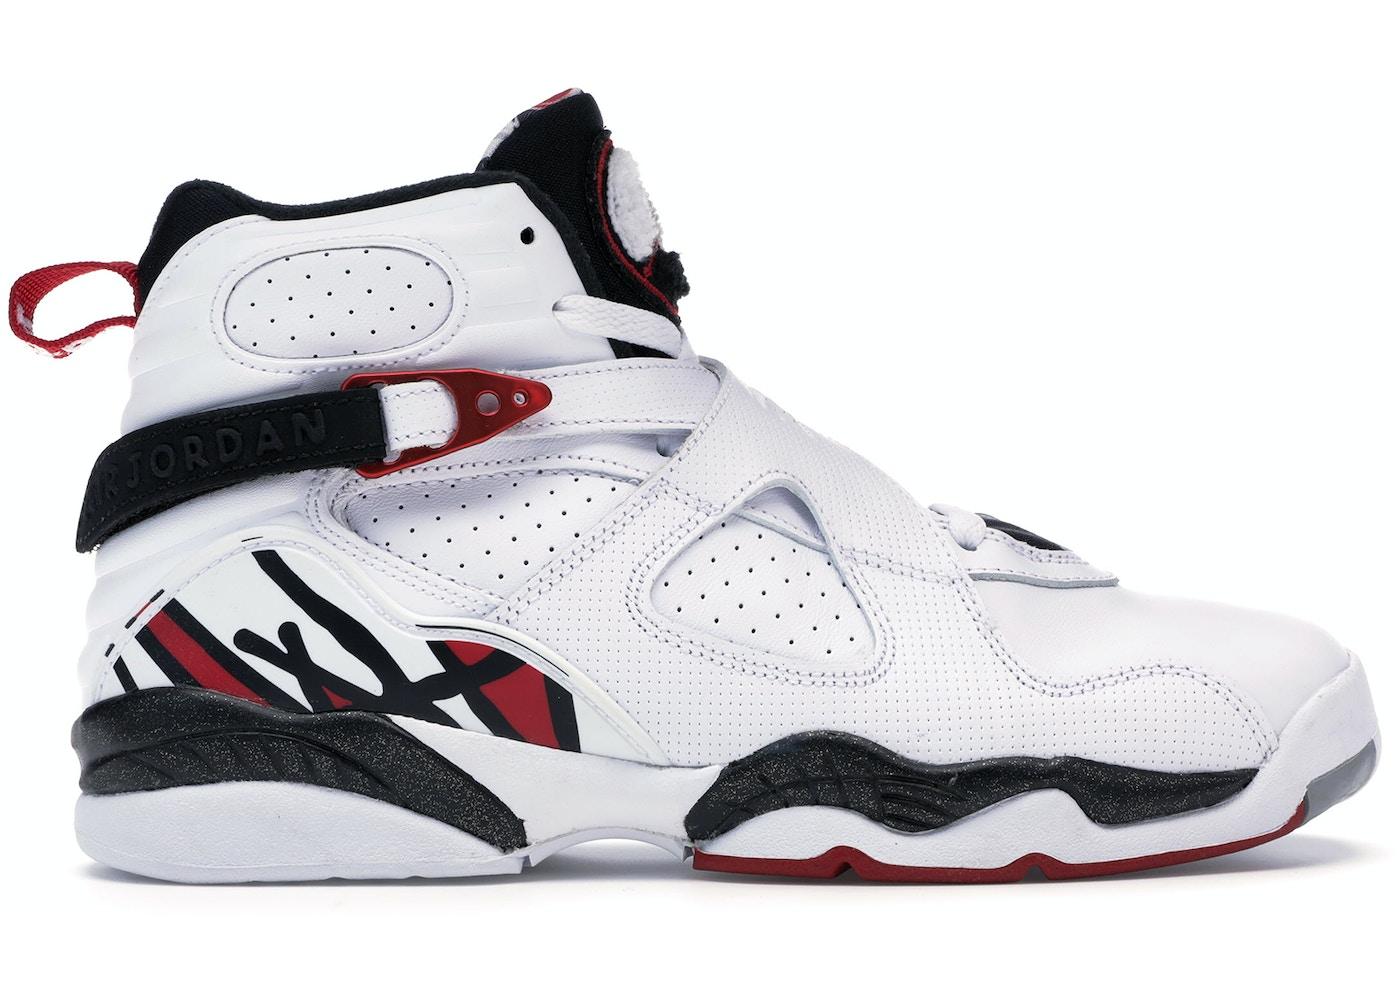 los angeles 488f2 f0a0f Buy Air Jordan 8 Shoes & Deadstock Sneakers